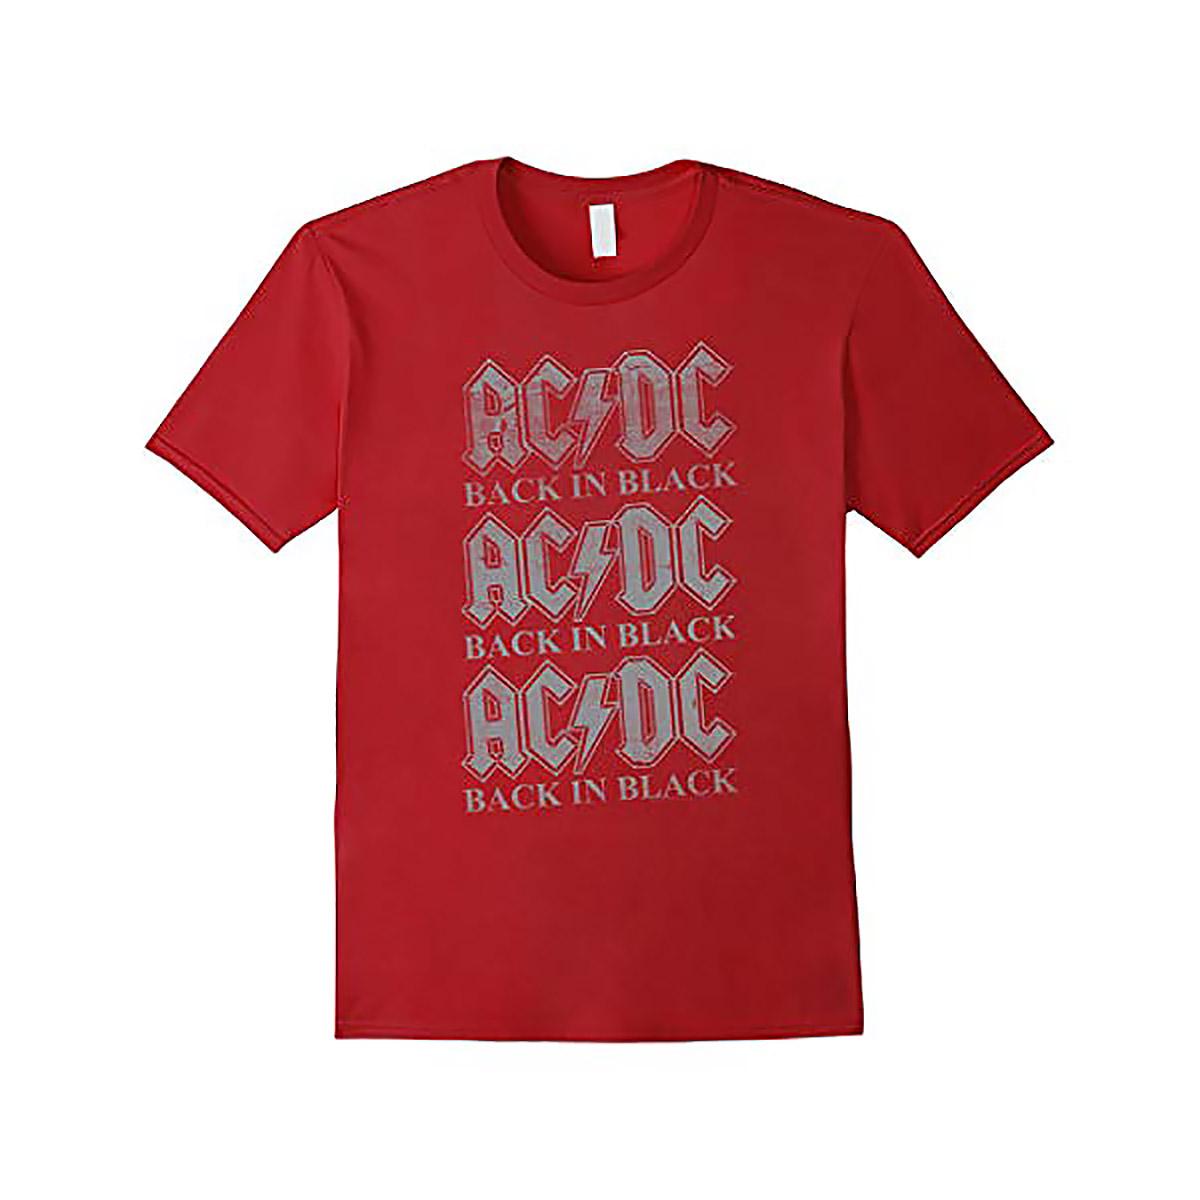 Repeat T-shirt